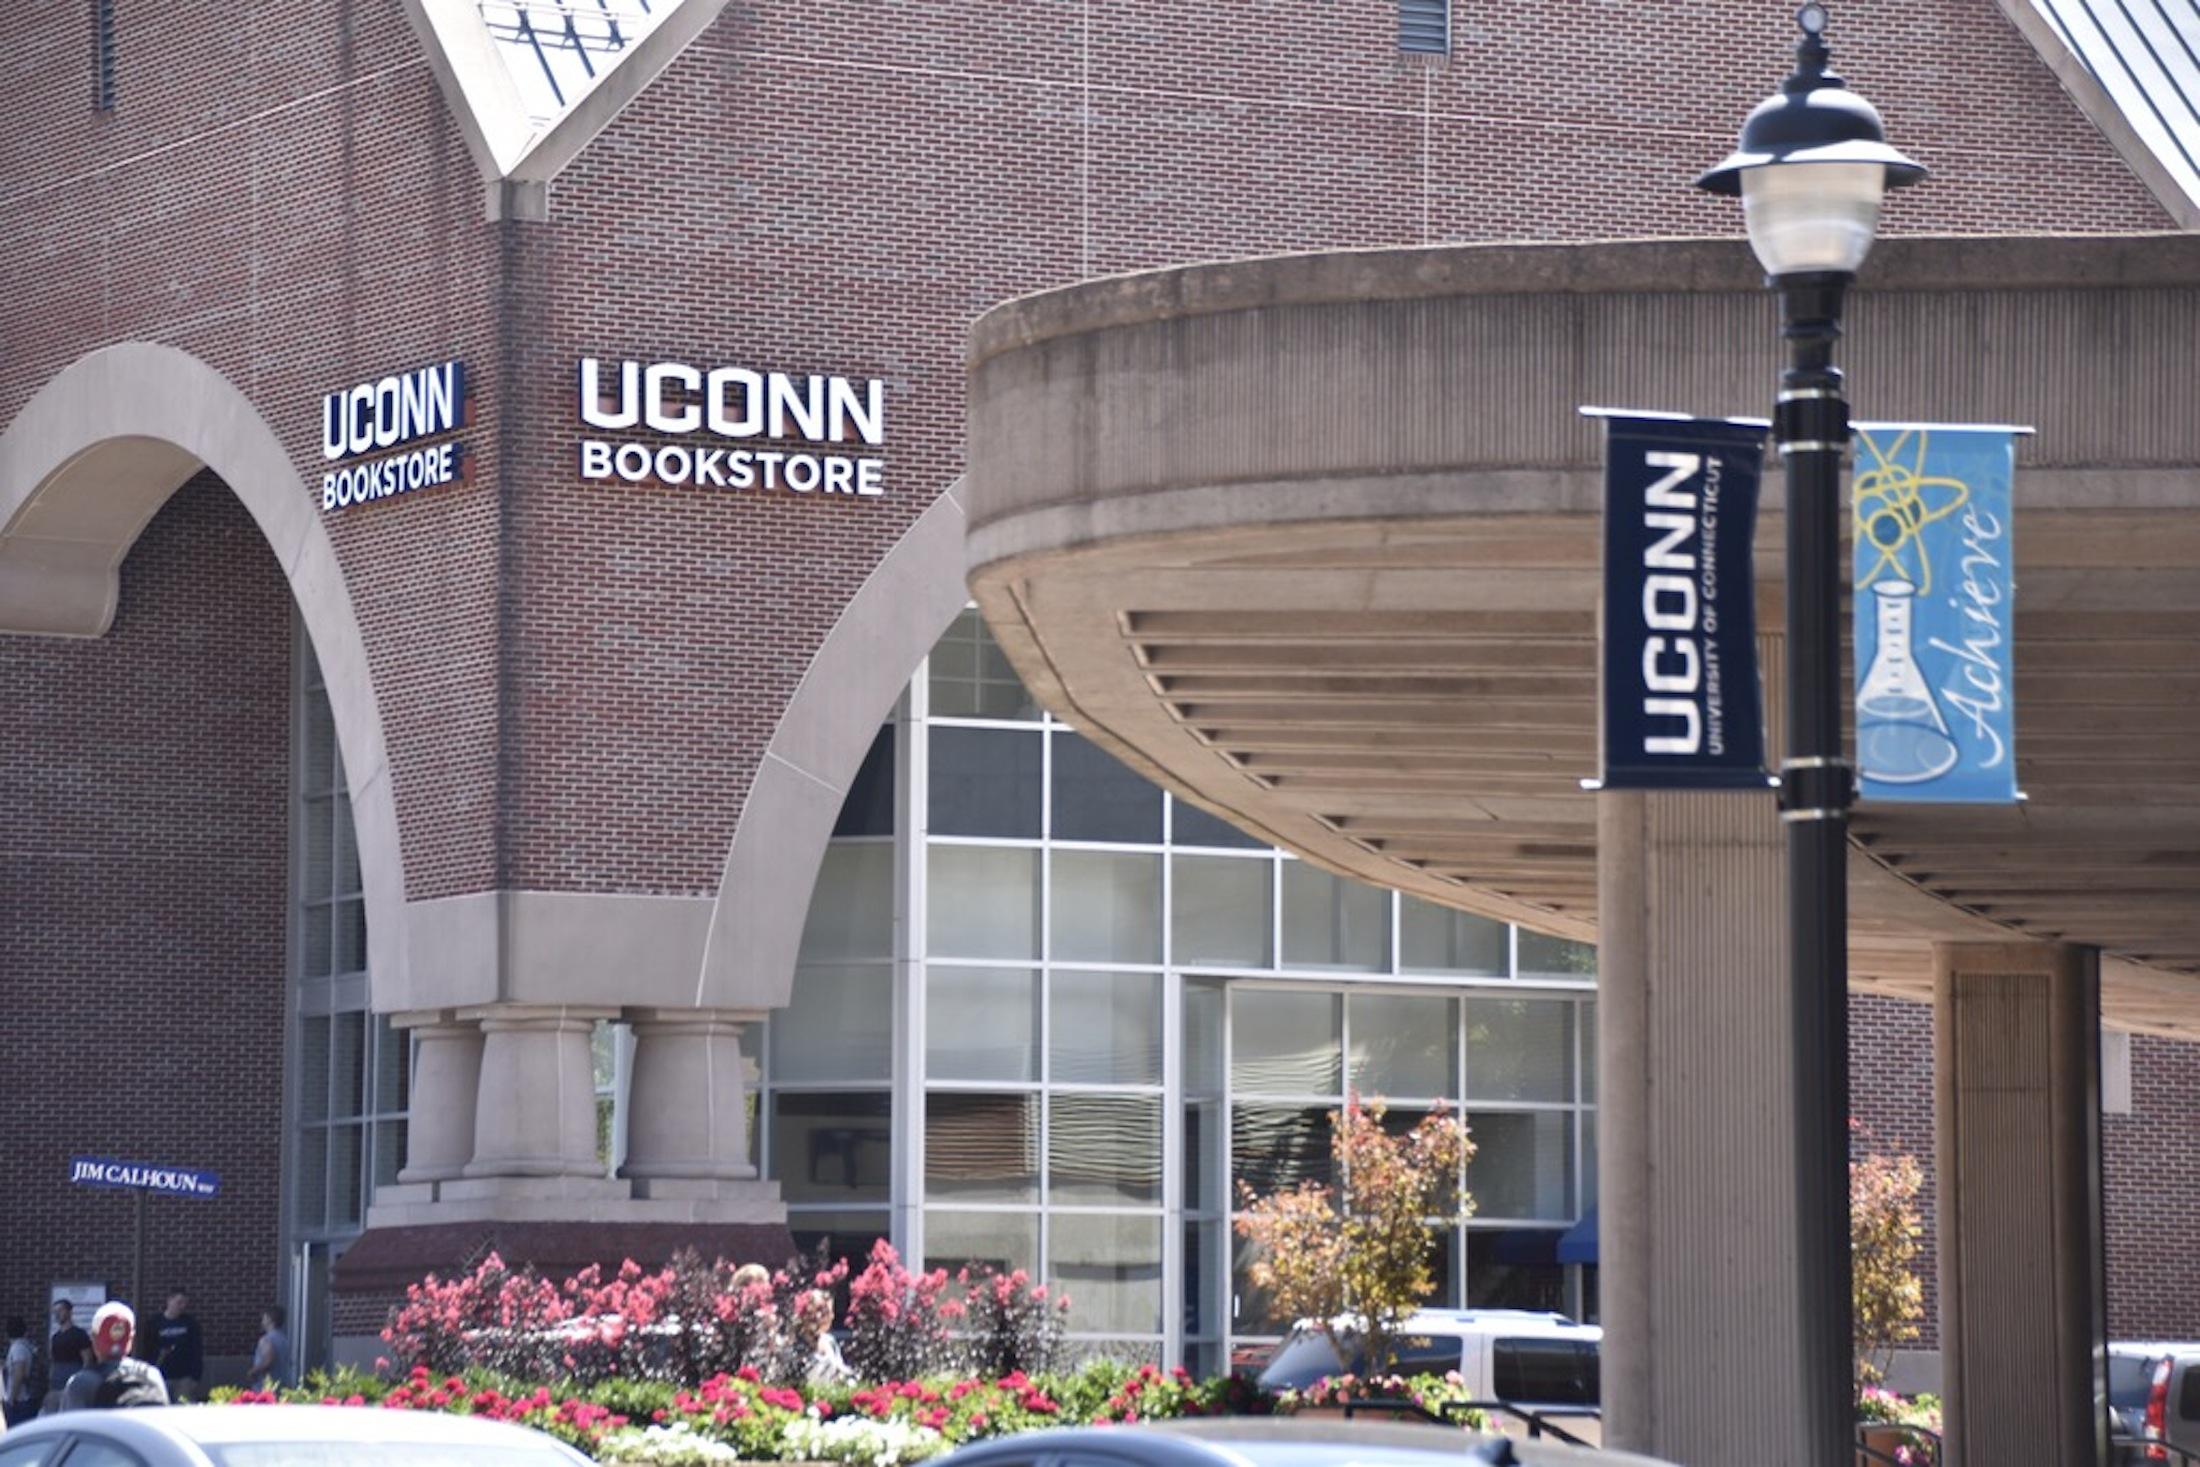 uconn bookstore phone